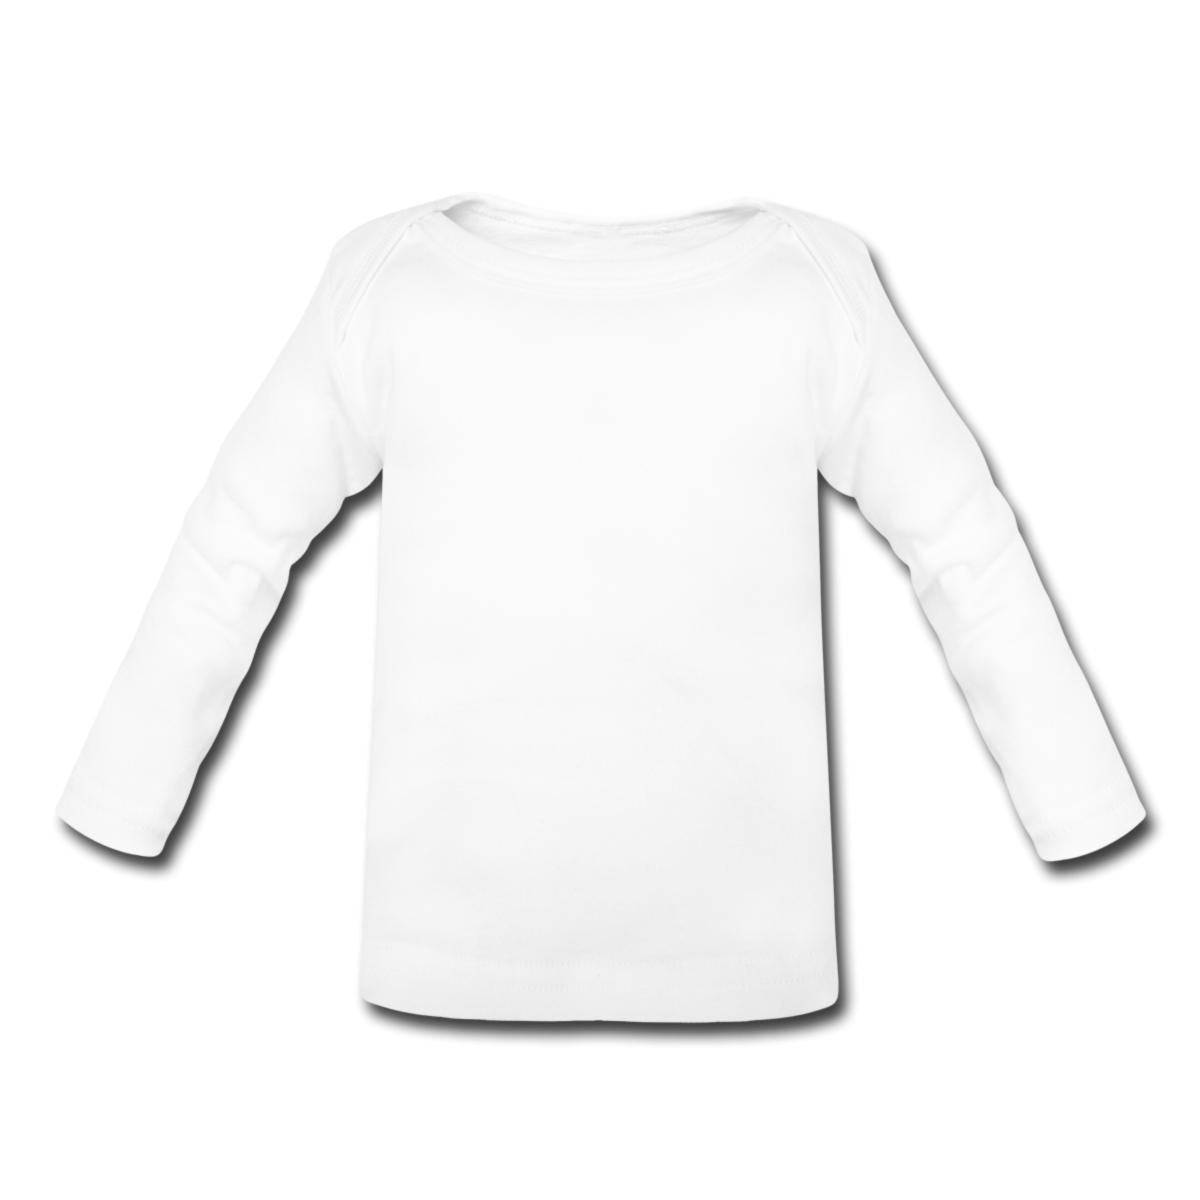 Long Sleeve Shirt Template Photoshop Bcd Tofu House